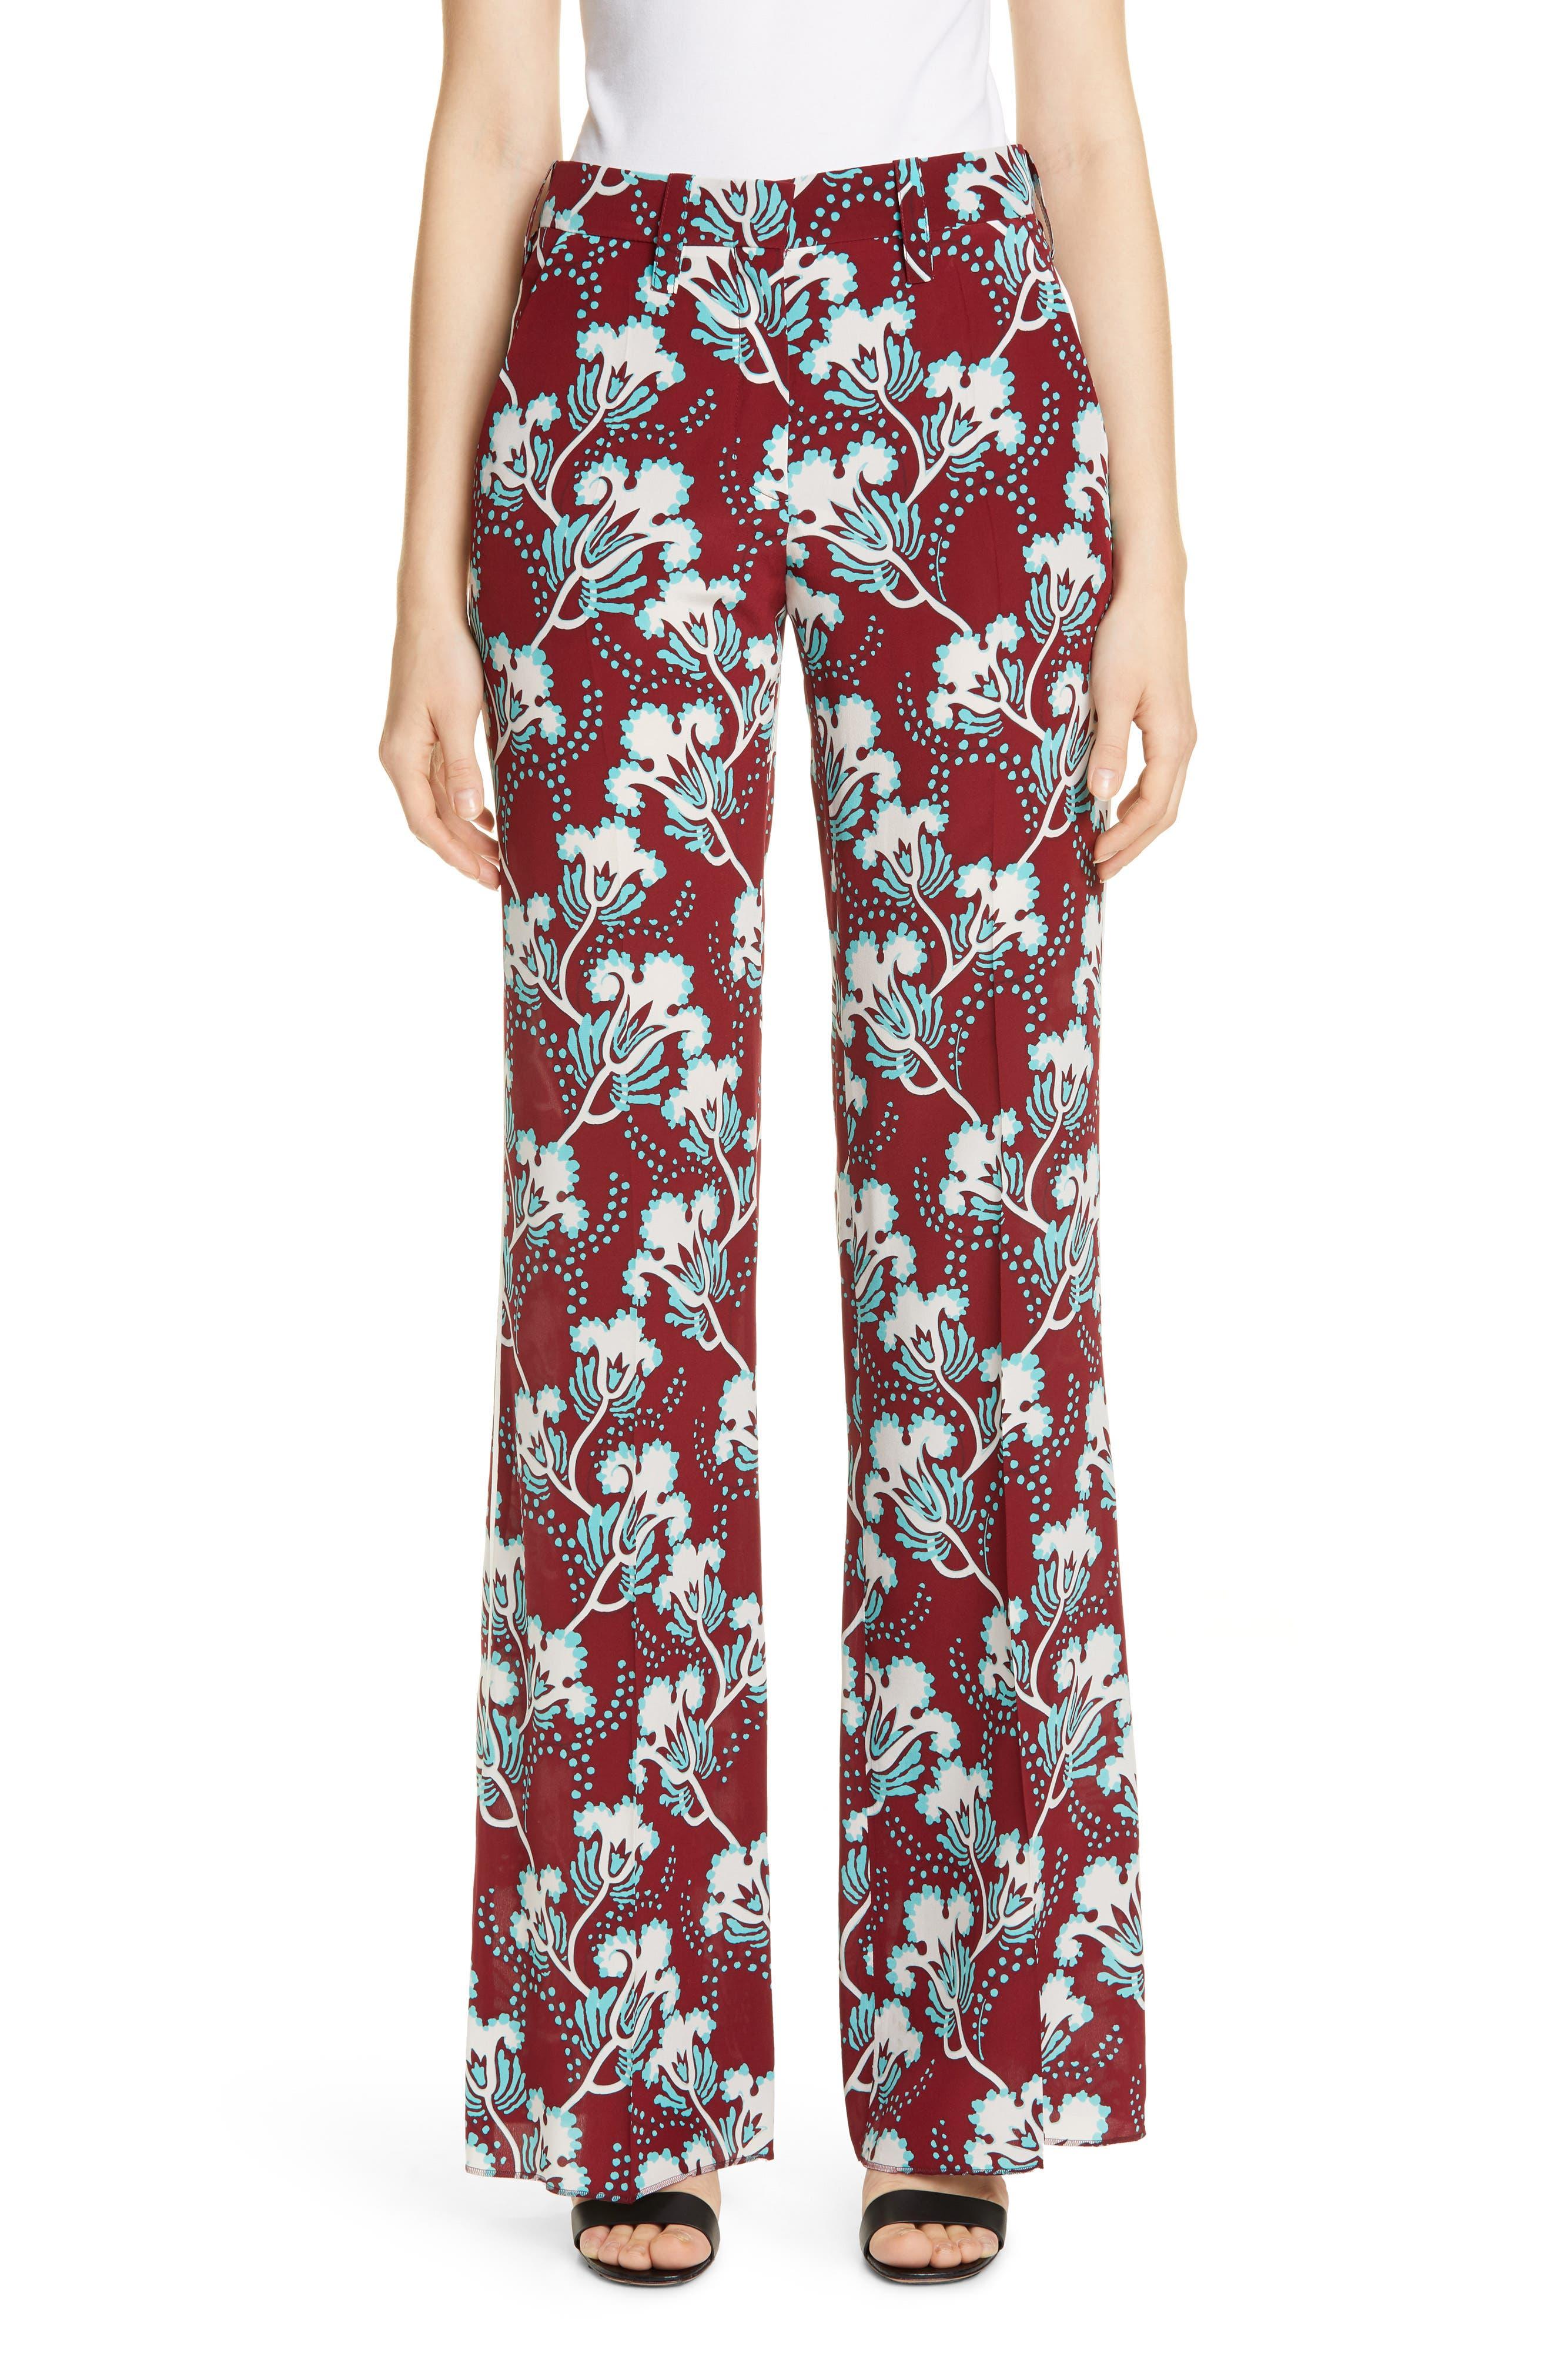 VALENTINO, Elderflower Print Wide Leg Silk Pants, Main thumbnail 1, color, GTB-GARNET/TURCHESE/BIANCO